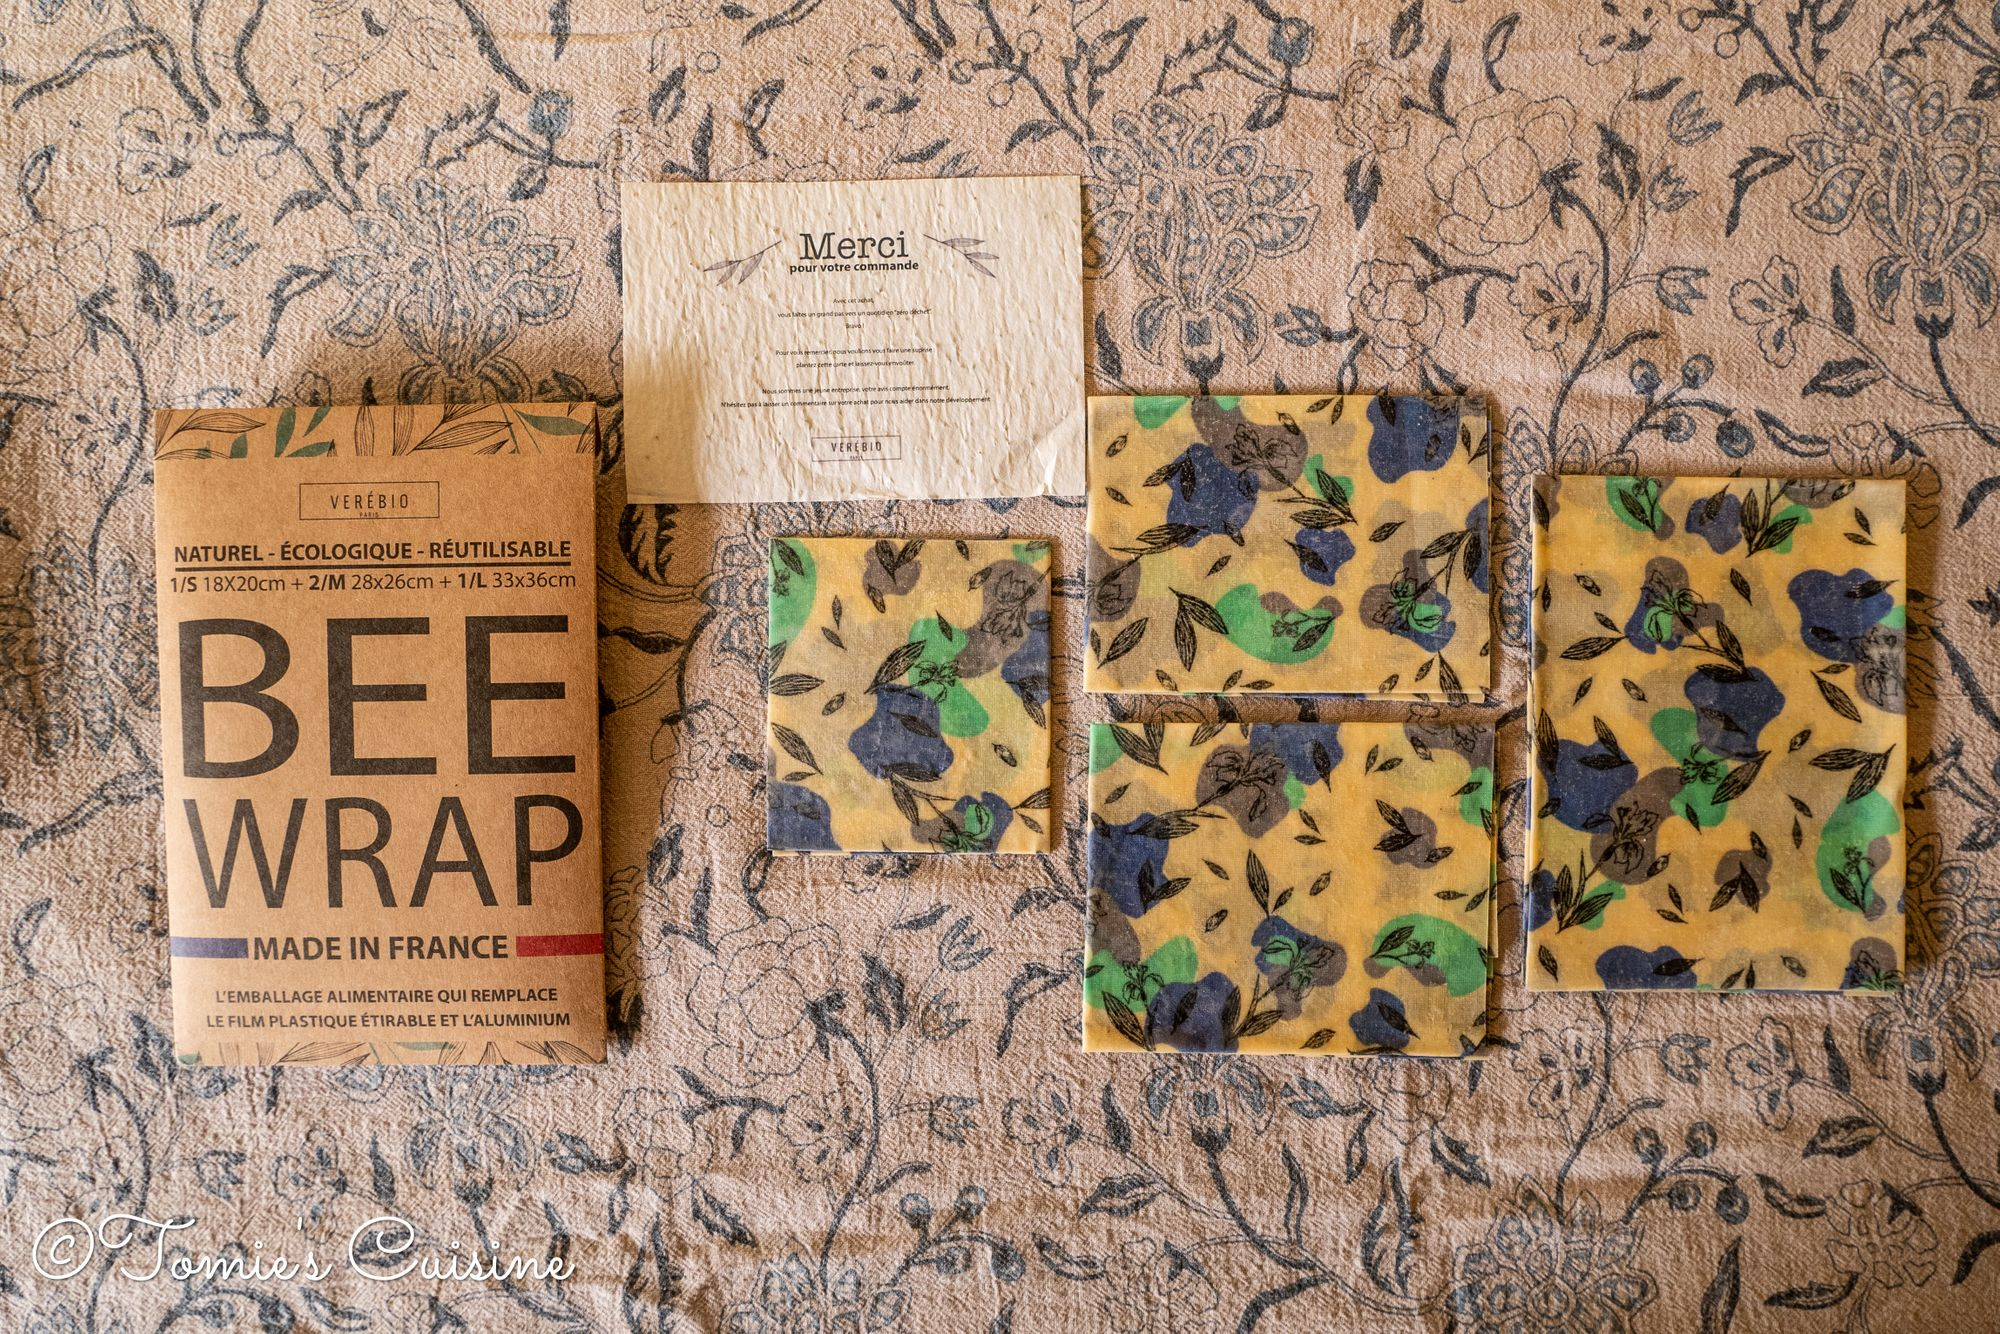 Verebio's BEE Wrap set with the thank-you card